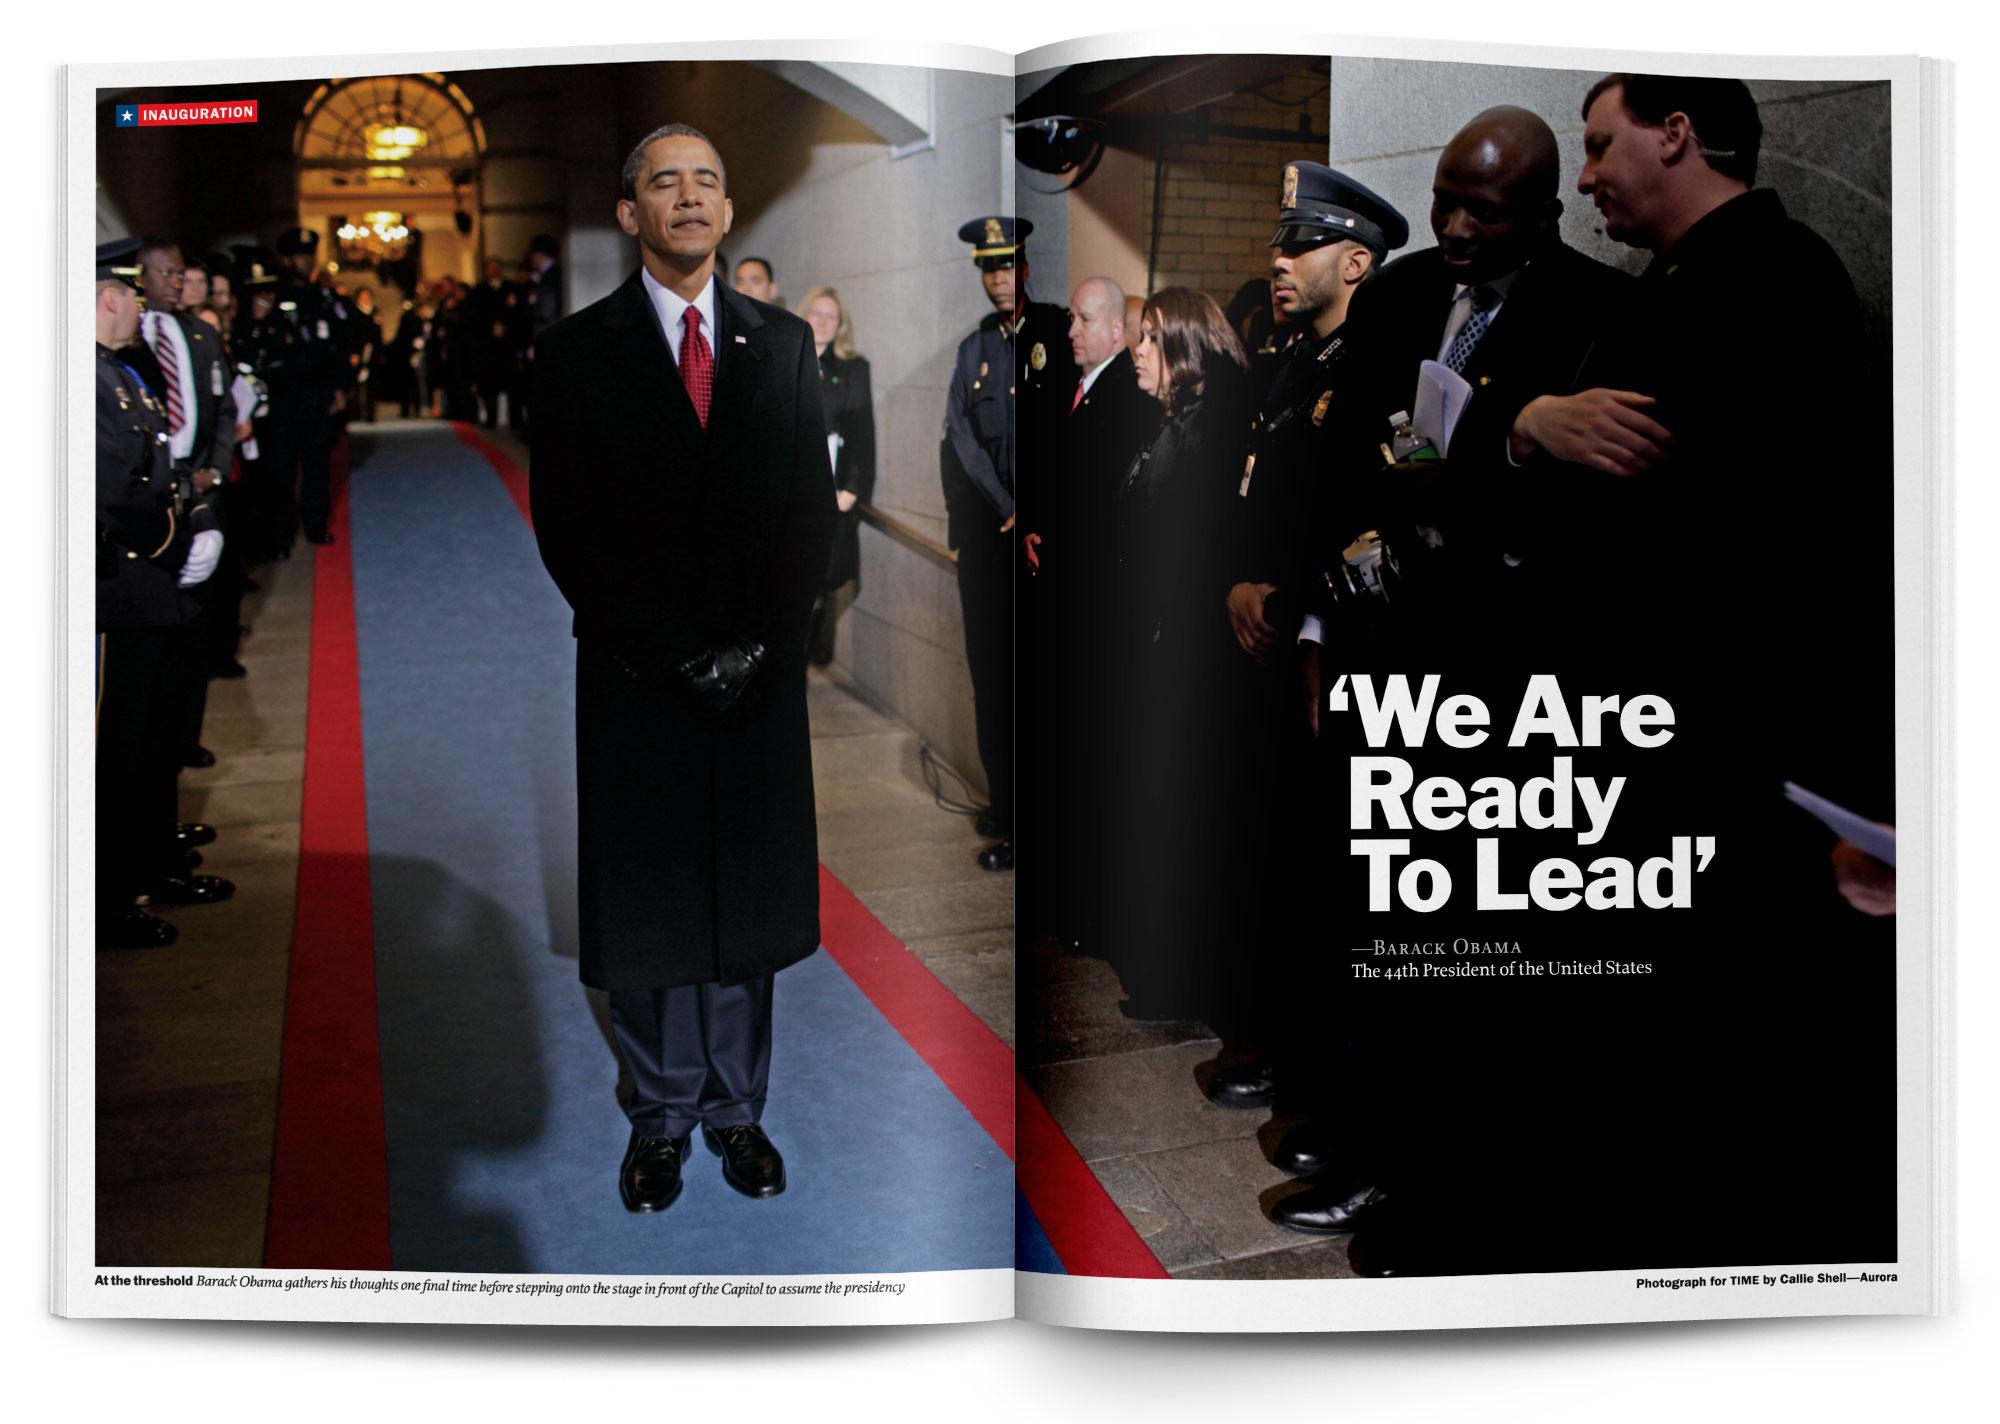 layouts.obamainaug1.jpg